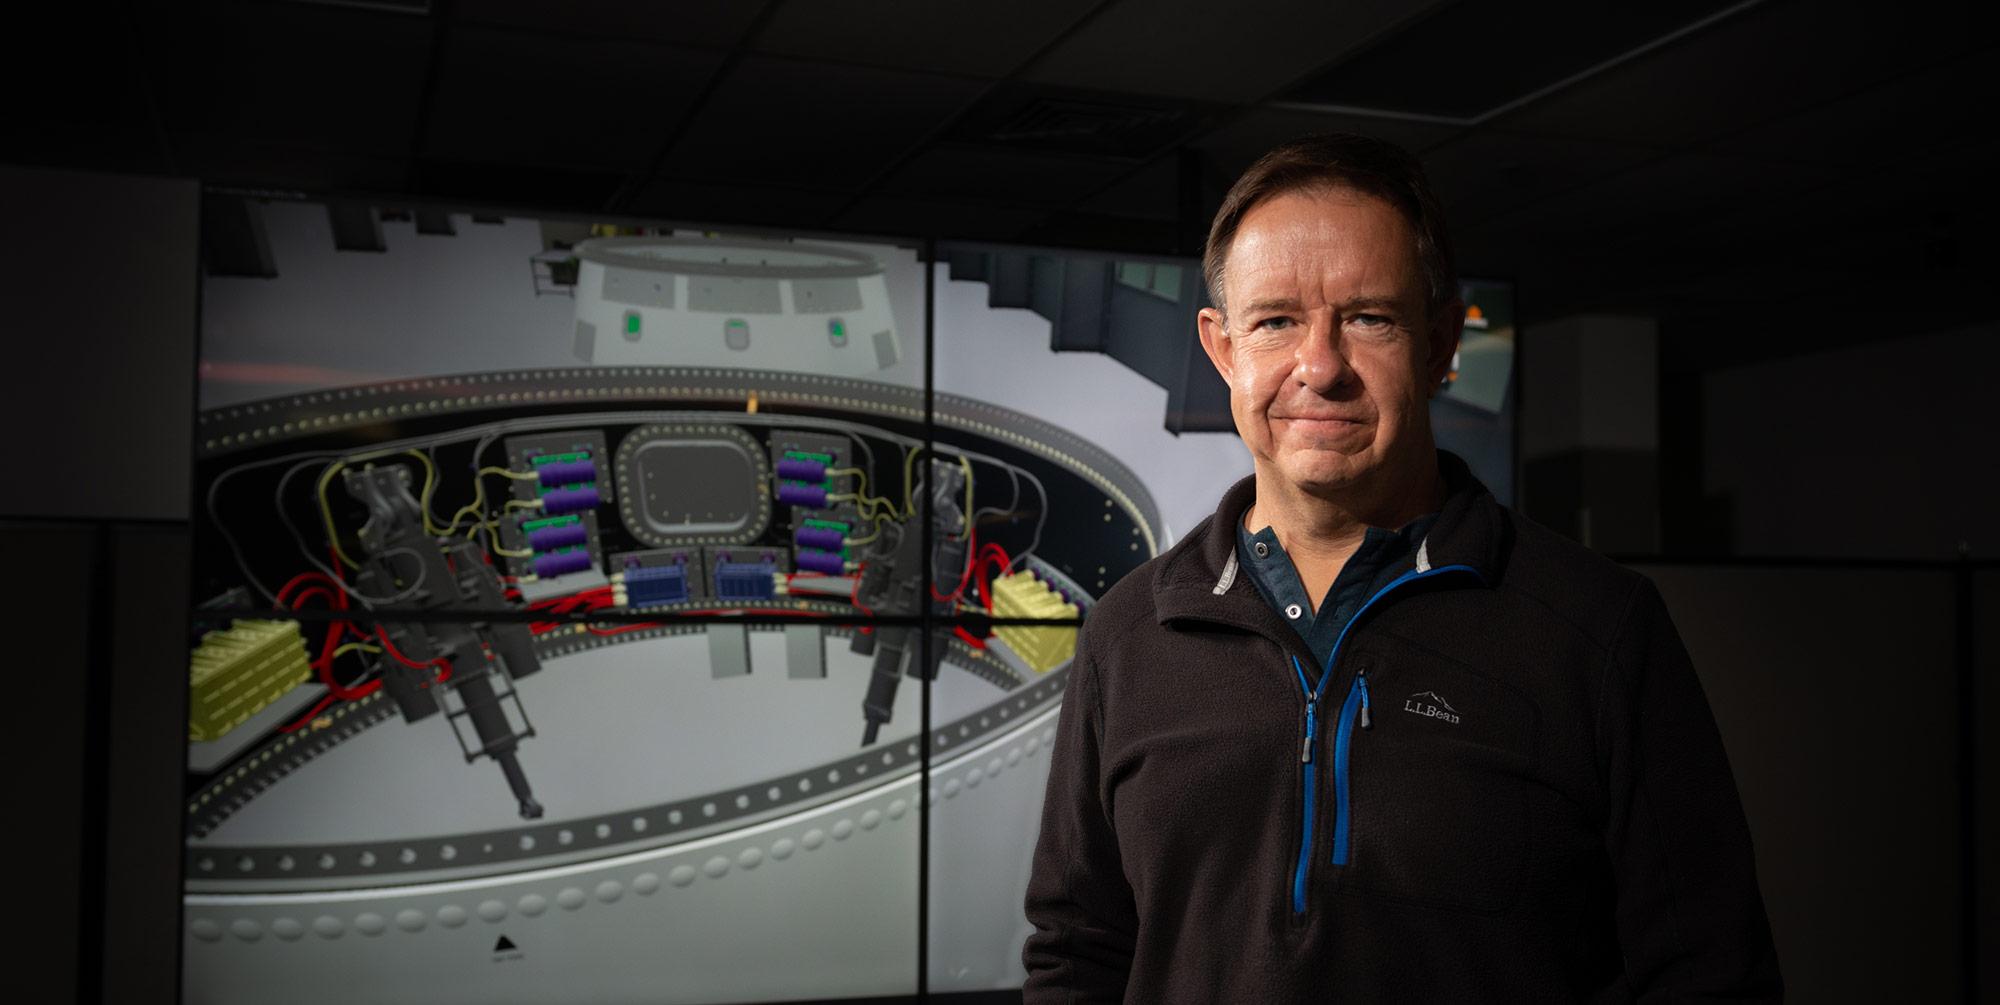 Digital Engineering Adopts 3D Virtual Reality Tools